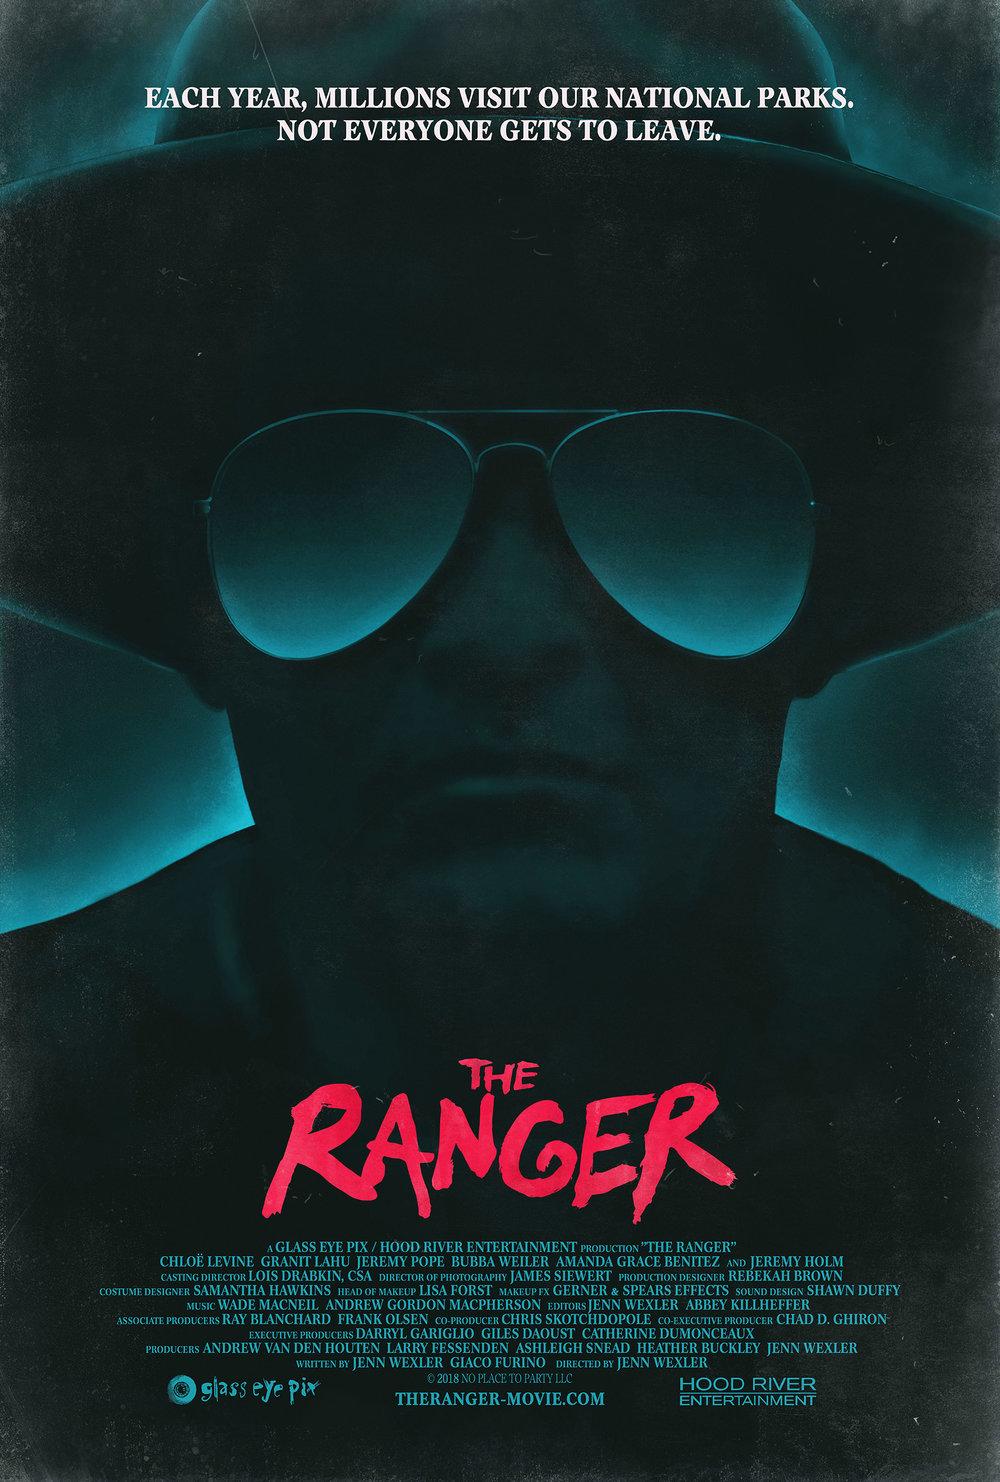 THE-RANGER-poster-final